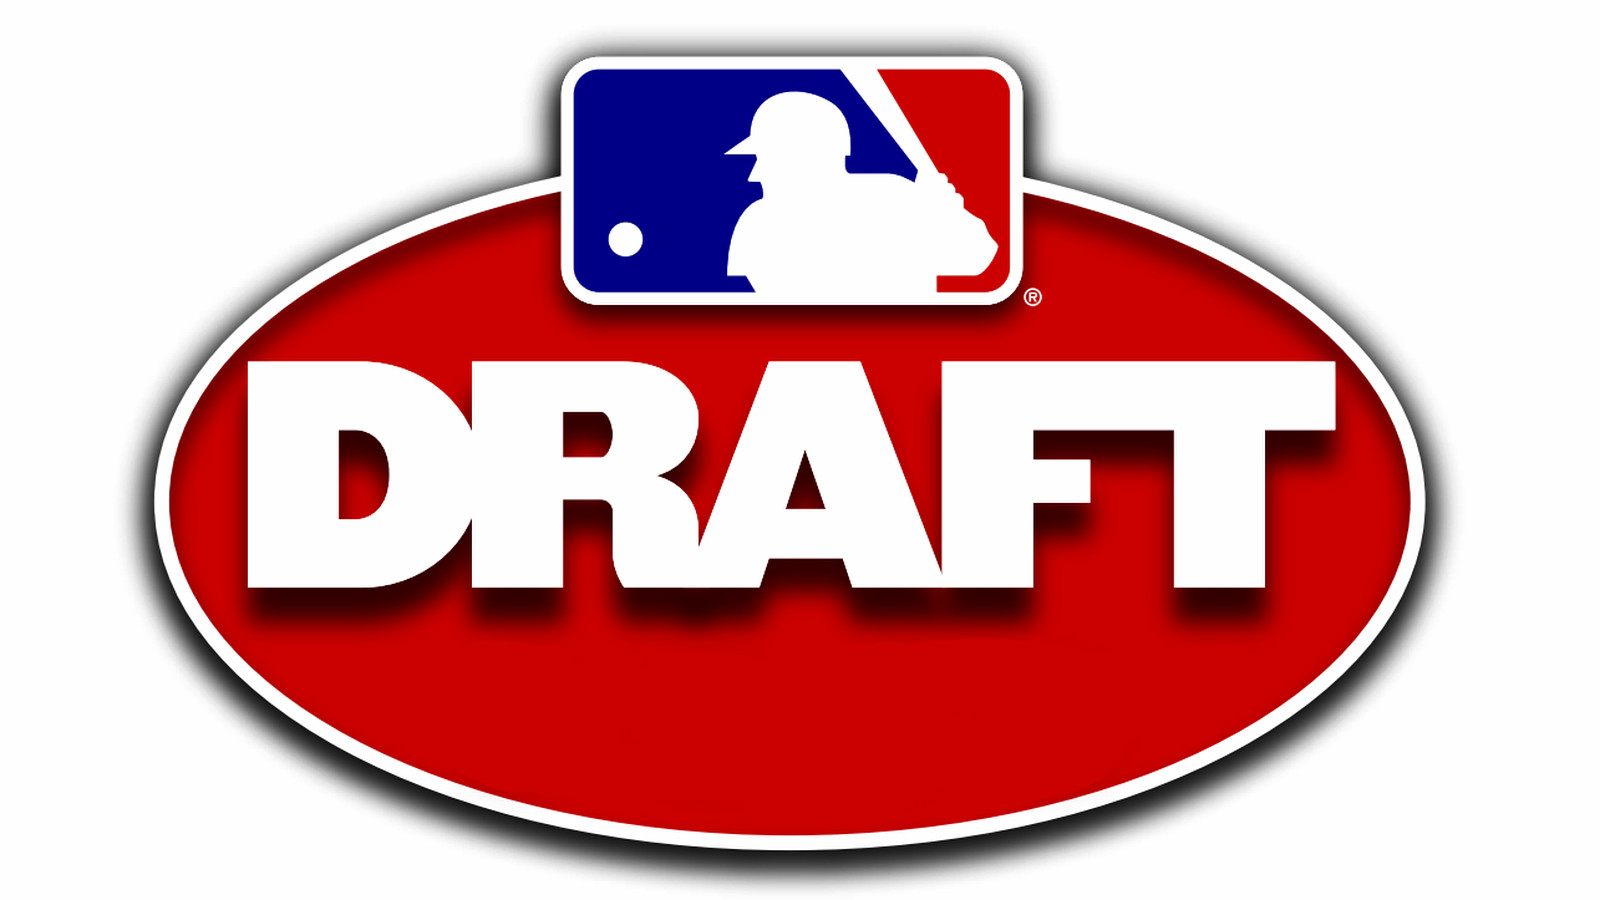 Mlb_draft_logo.0